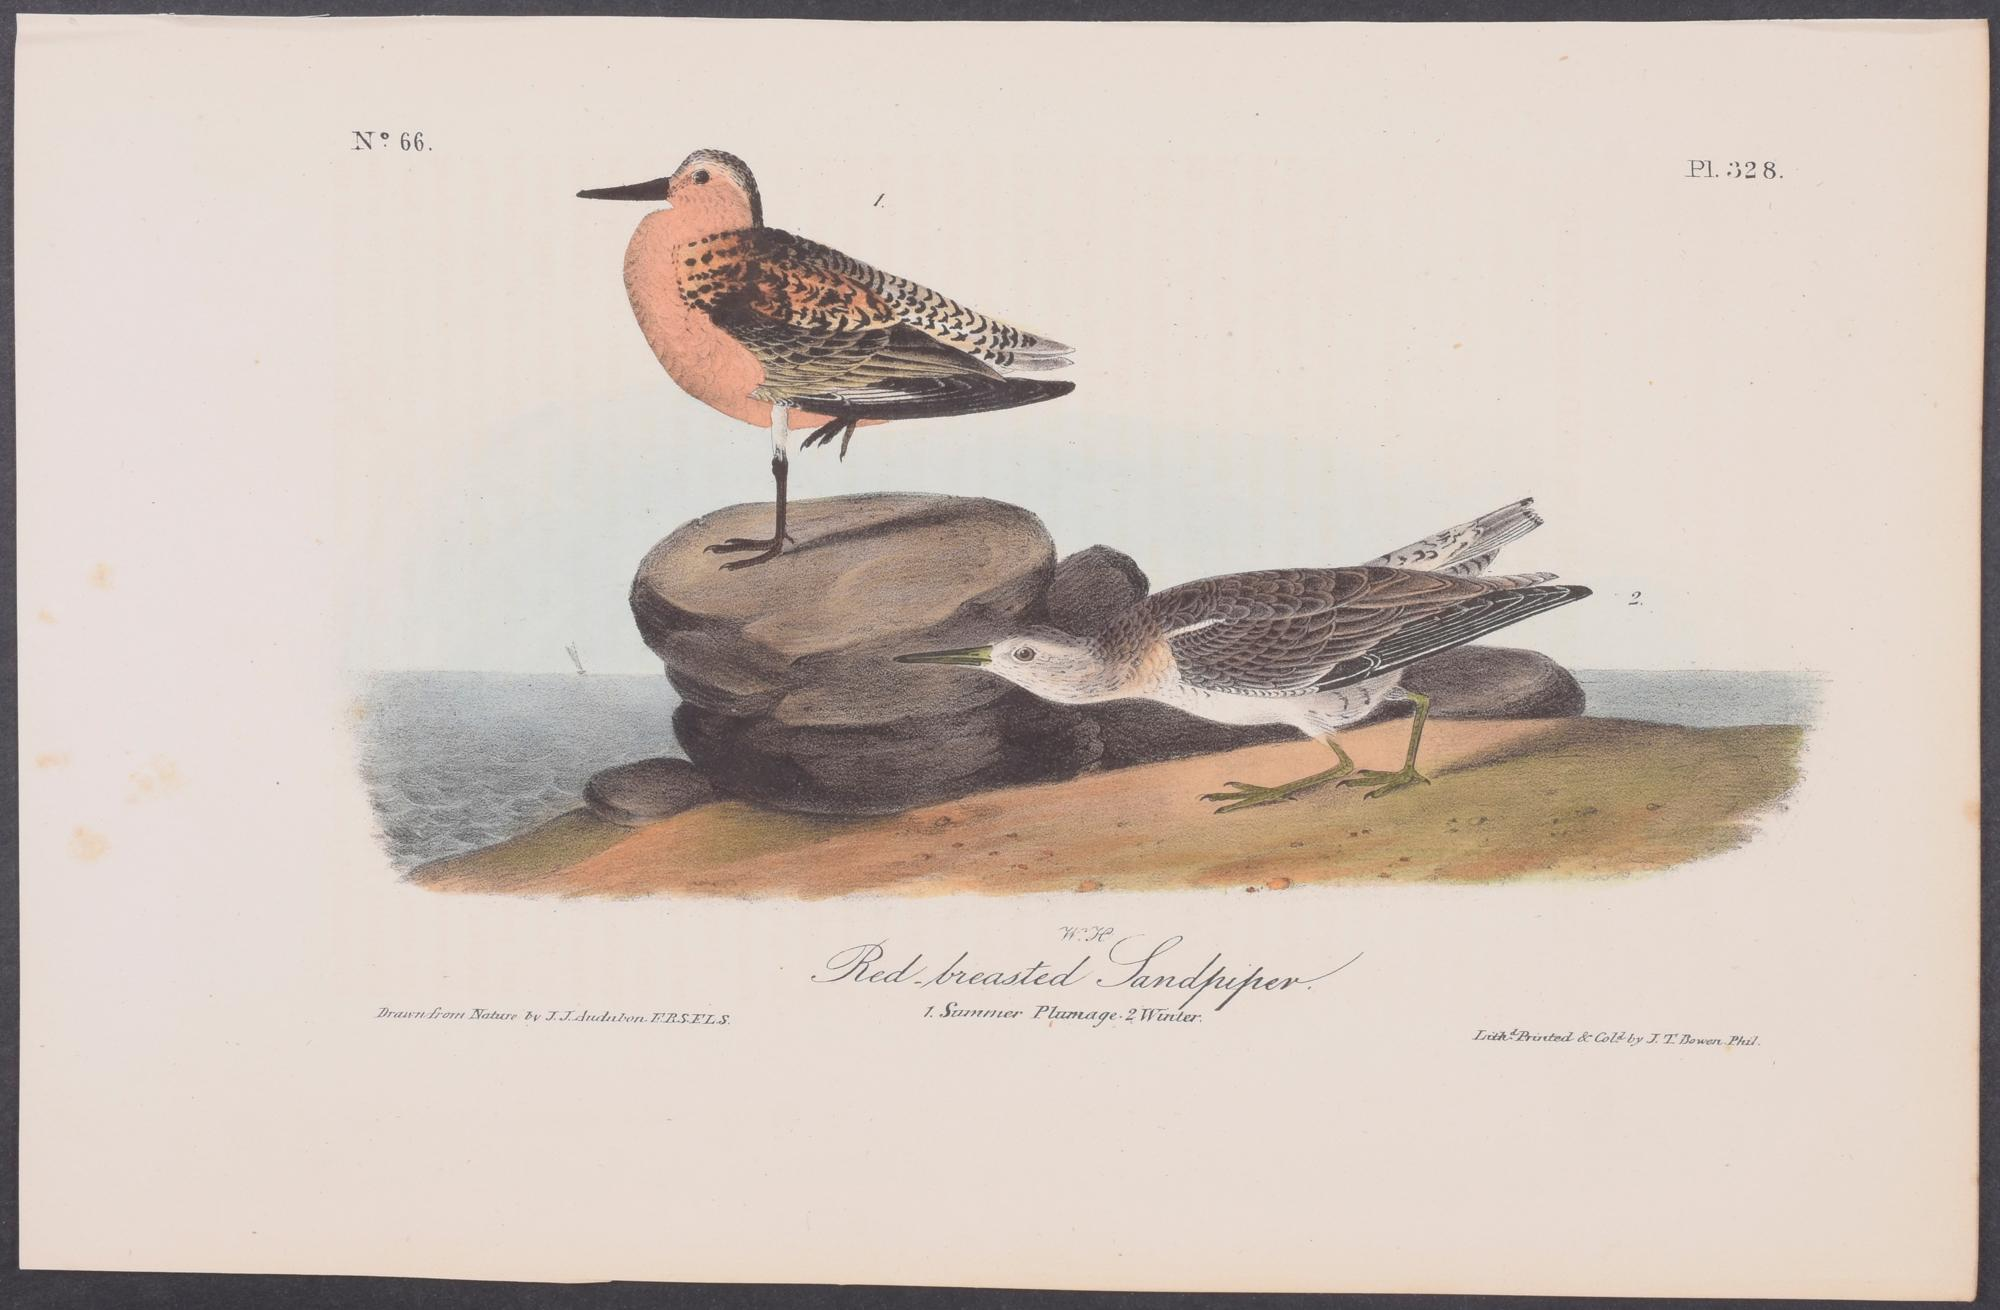 Red-breasted Sandpiper John James Audubon [Fine] (bi_30178213537) photo